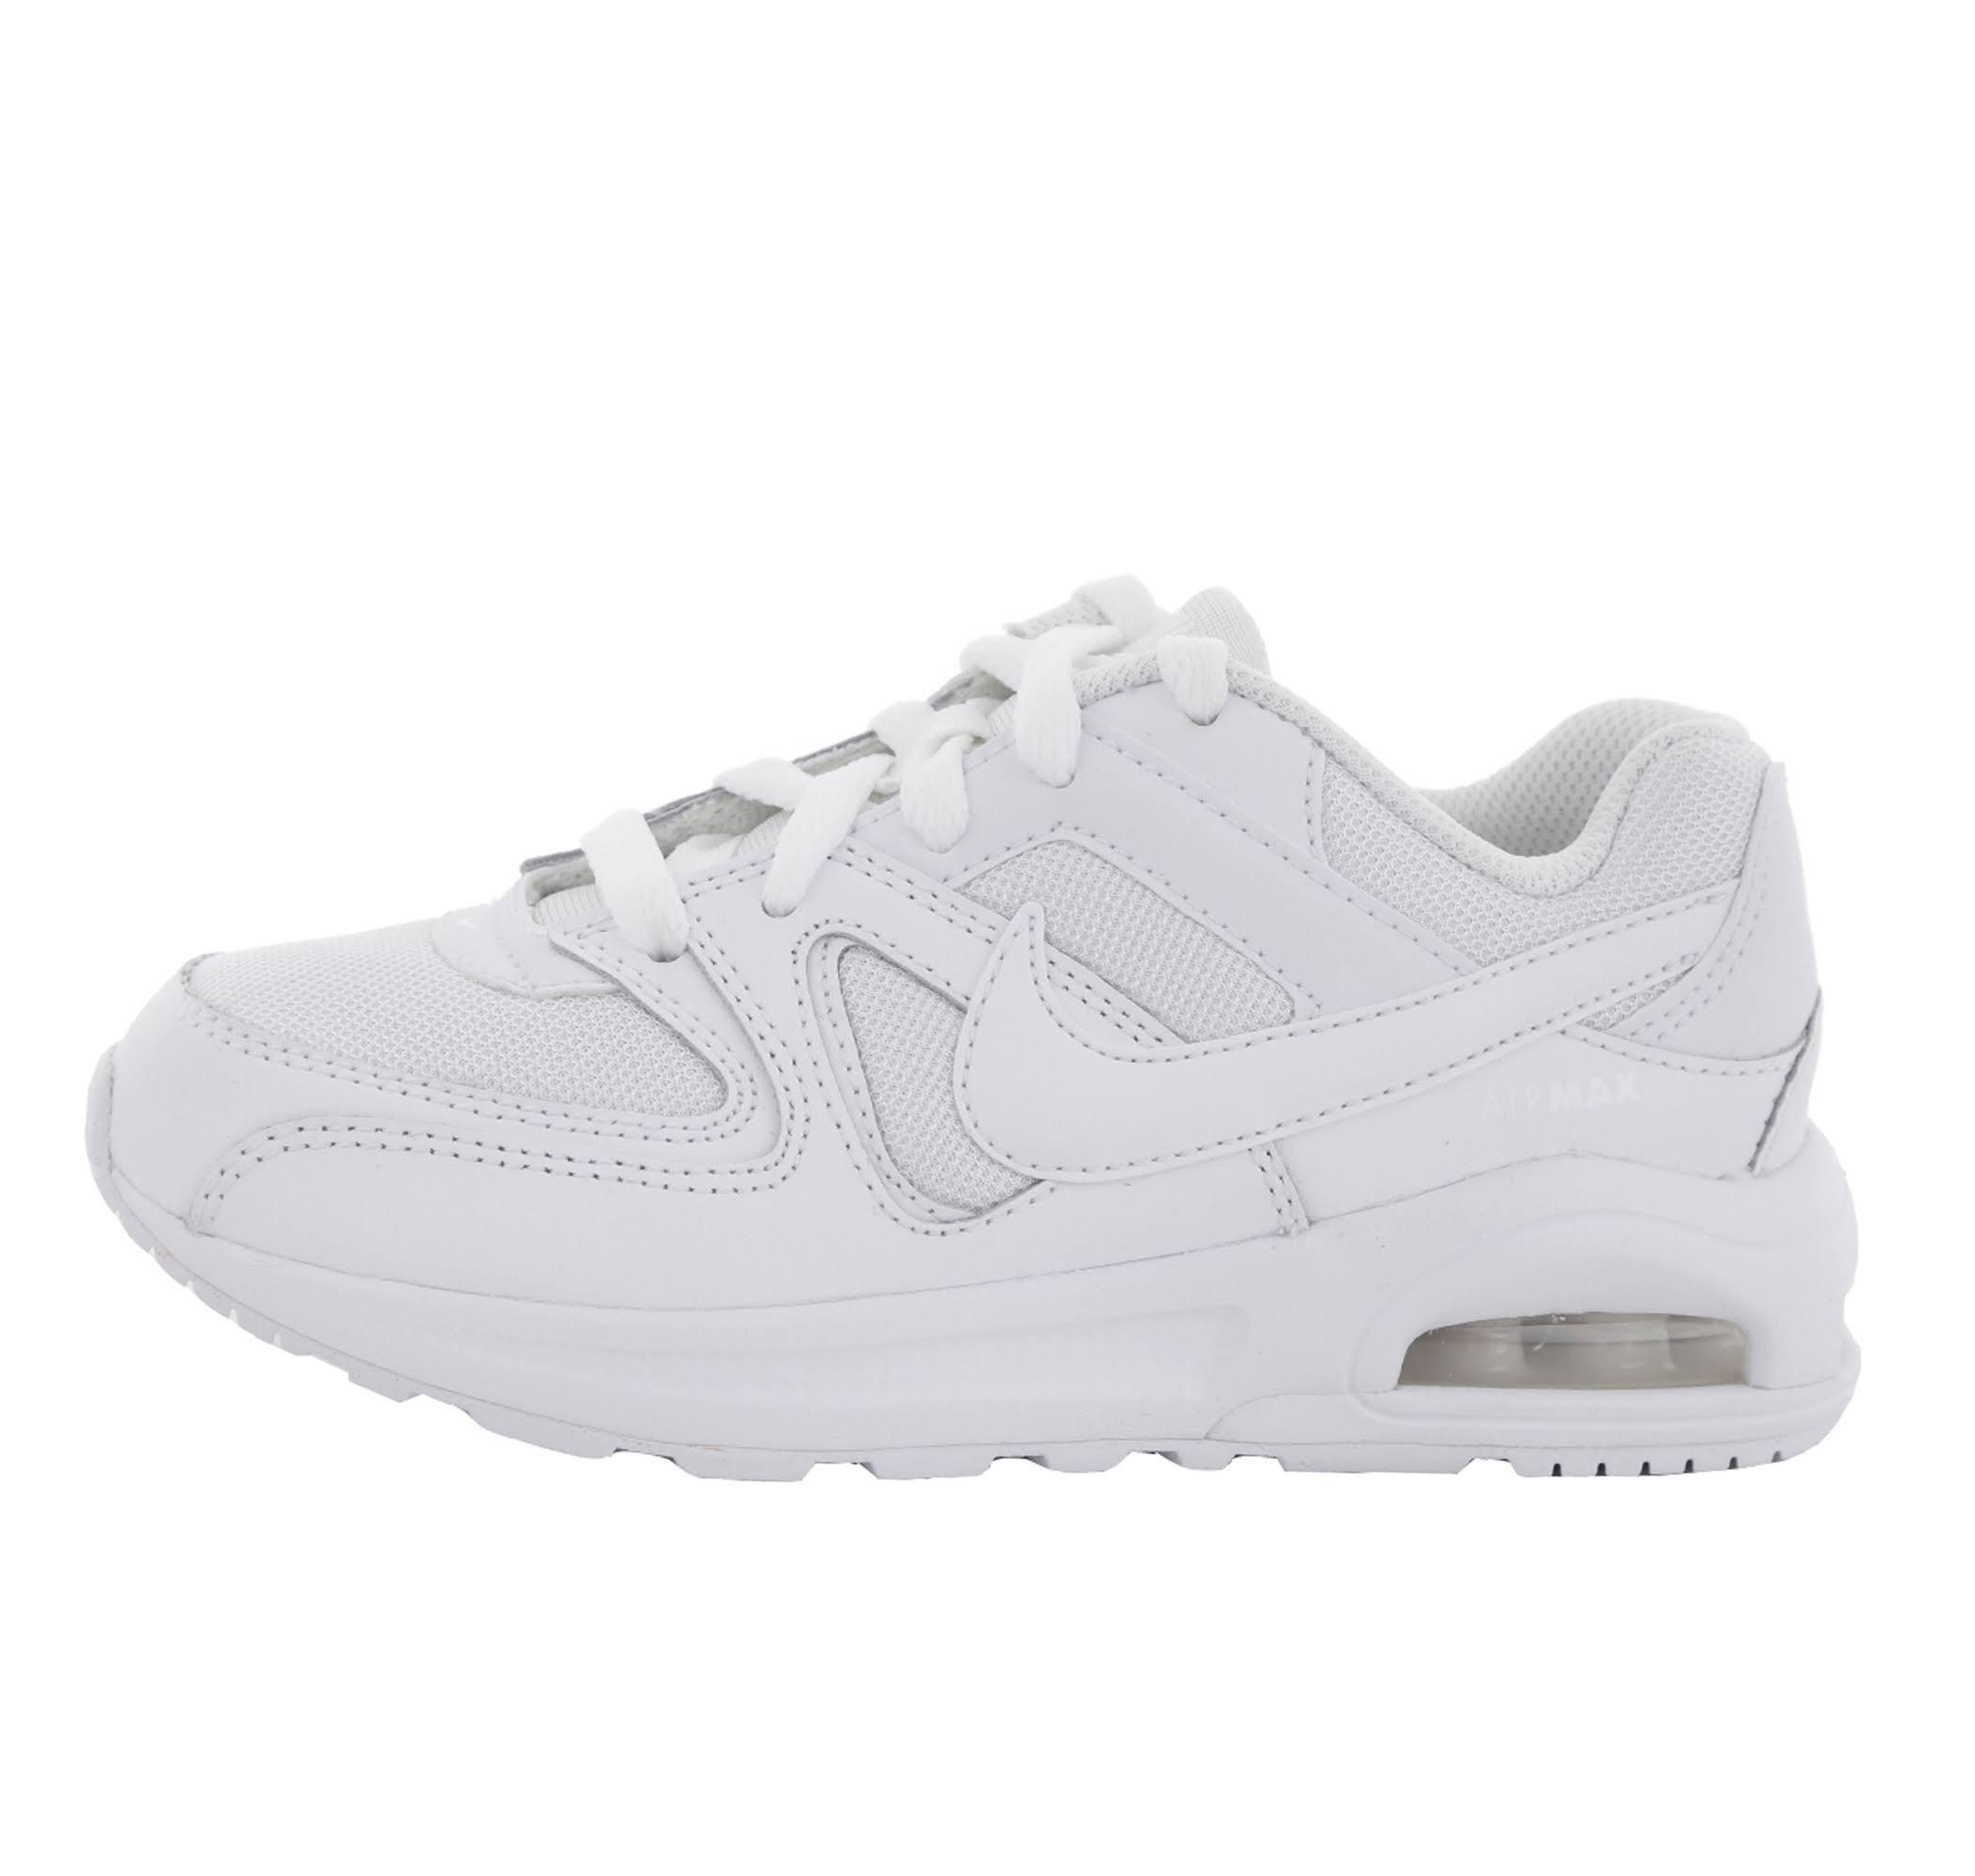 Air Çocuk Ayakkabı 844347 Nike 30 Spor 101 Flex Command Max Beyaz Eqw6wxY